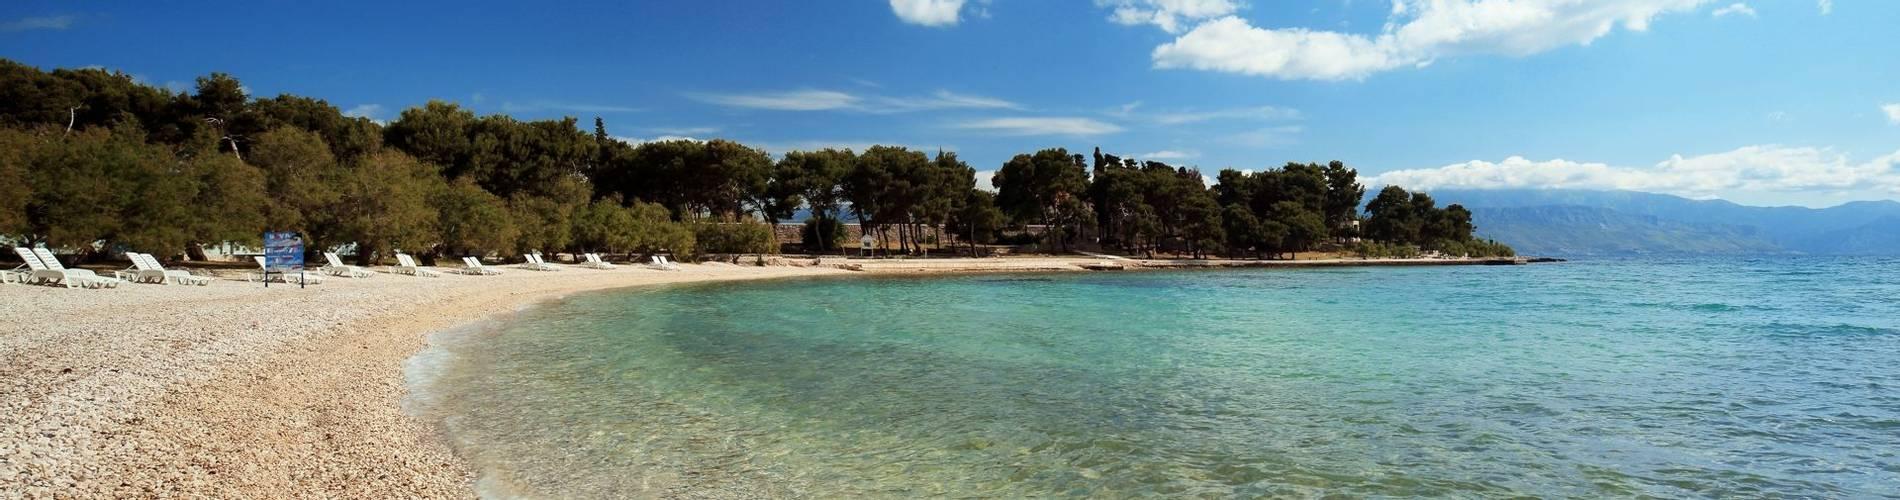 Hotel Villa ADRIATICA 2014 ZSupetar Beach1 9X19 panorama 27MB.jpg